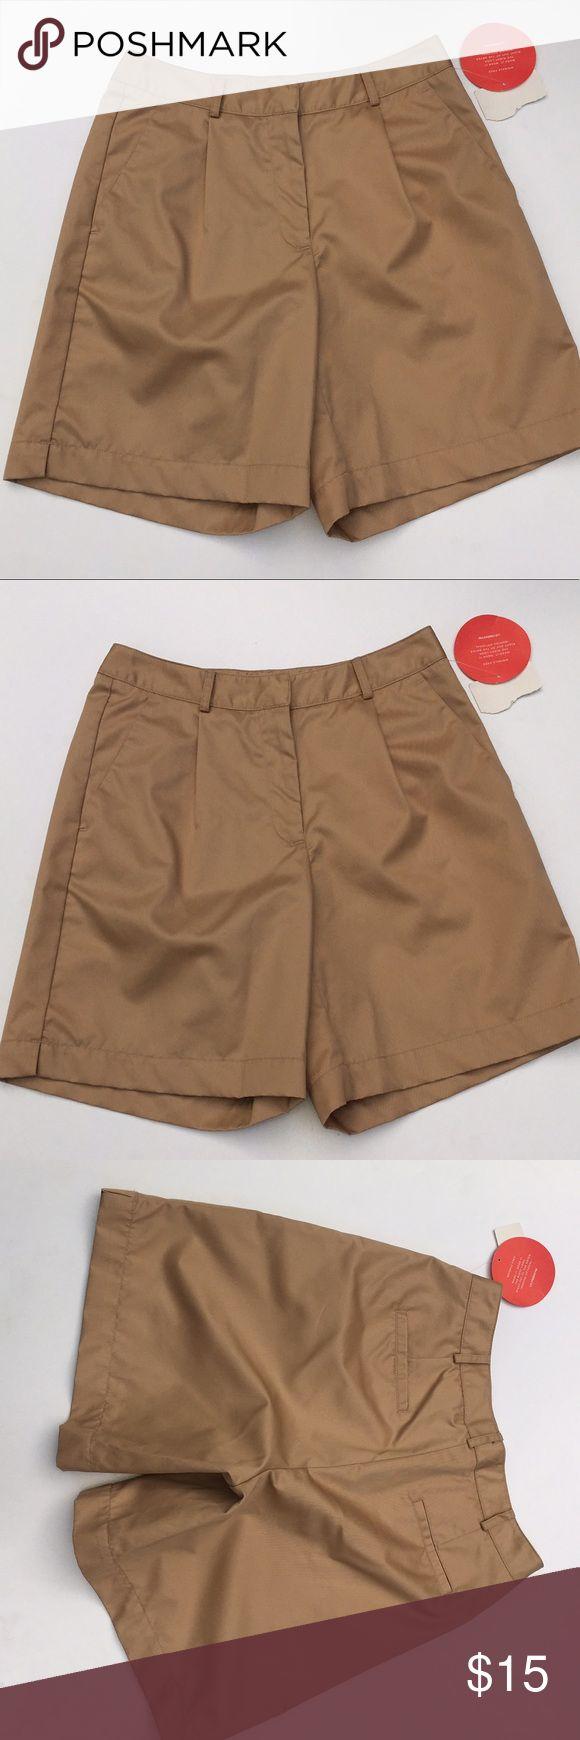 Liz Claiborne activewear shorts Liz Claiborne activewear wrinkle free women's shorts Liz Claiborne Shorts